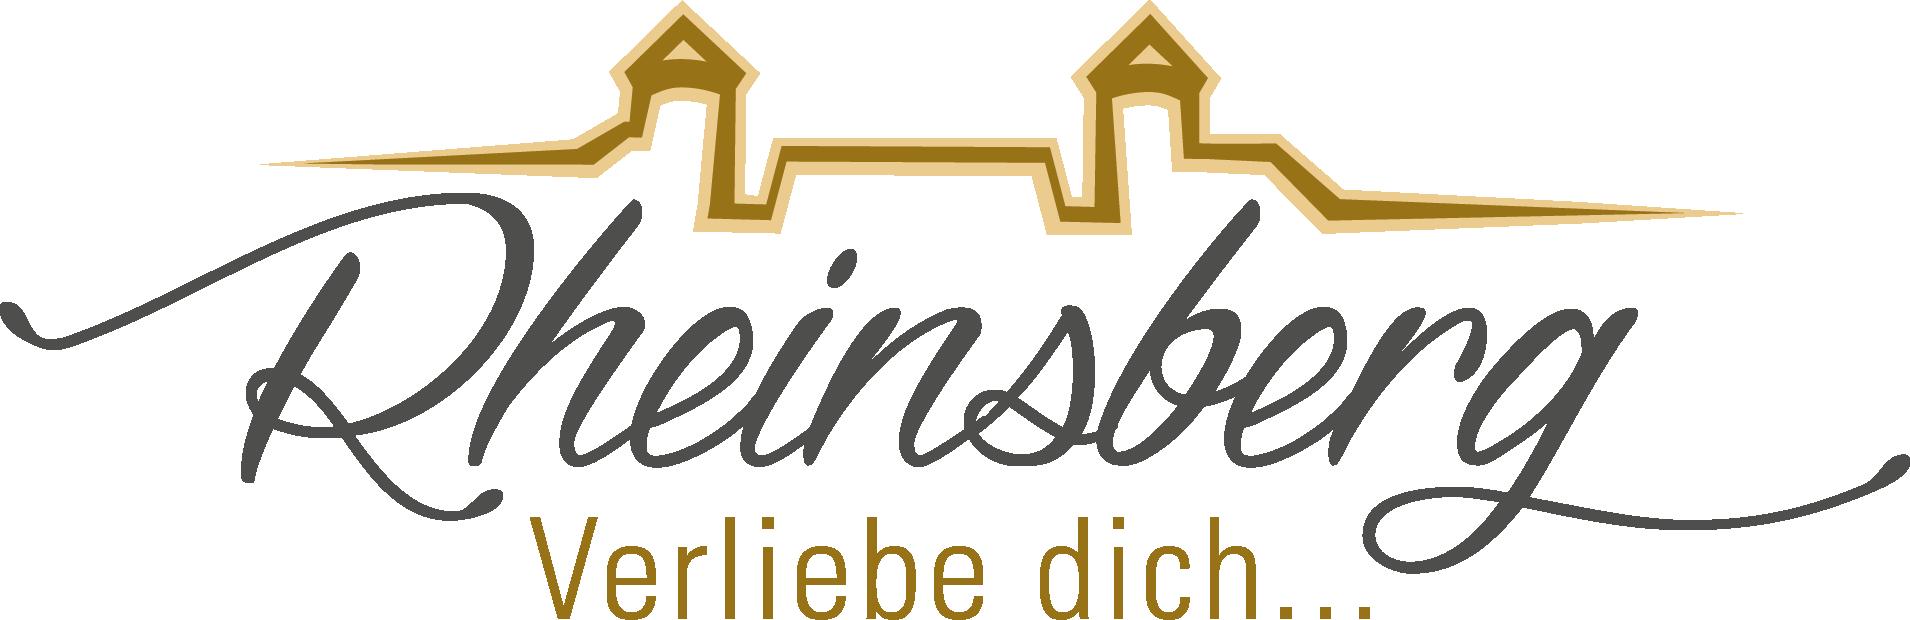 Logo Stadt Rheinsberg